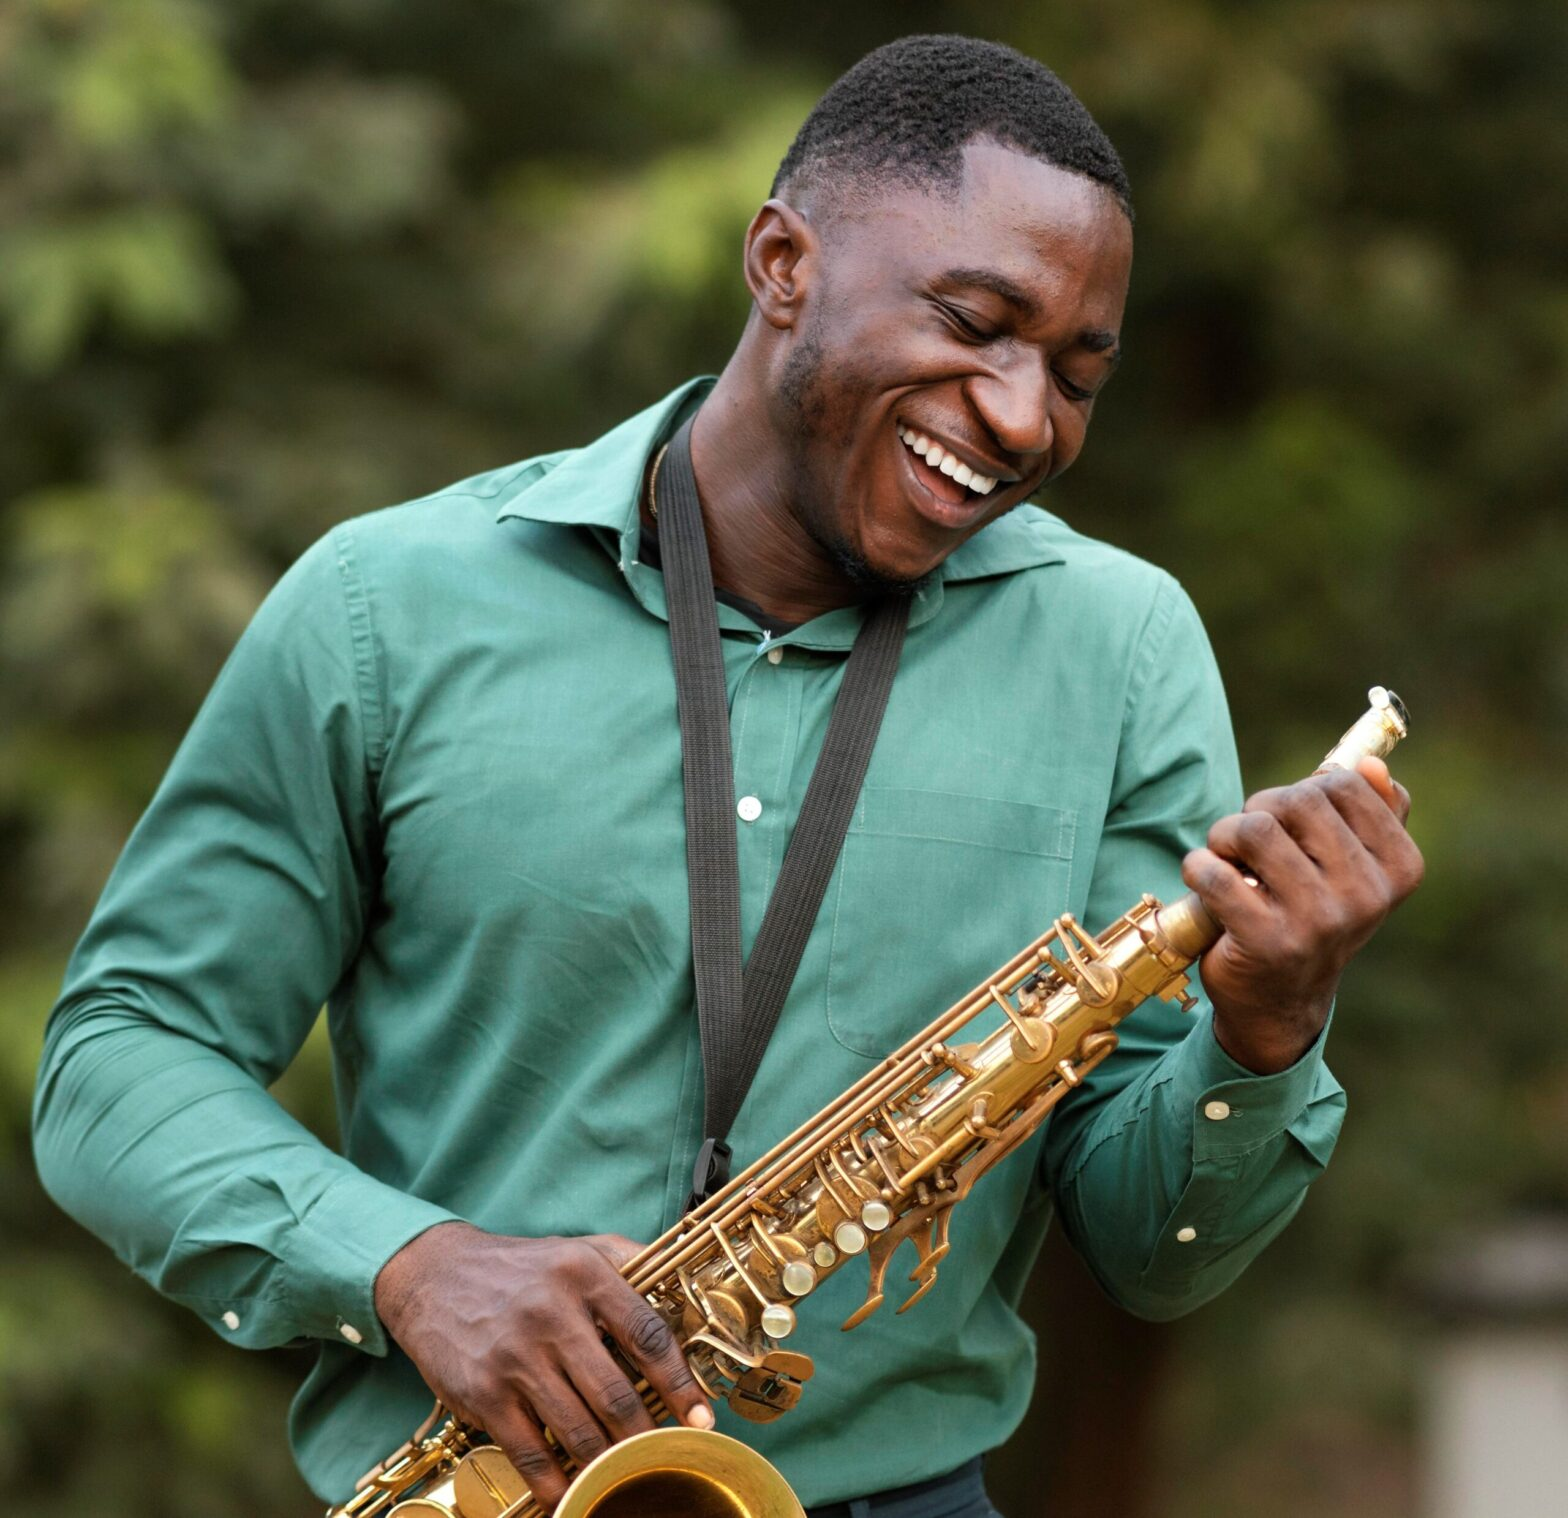 african-american-man-playing-instrument-international-jazz-day-scaled.jpg